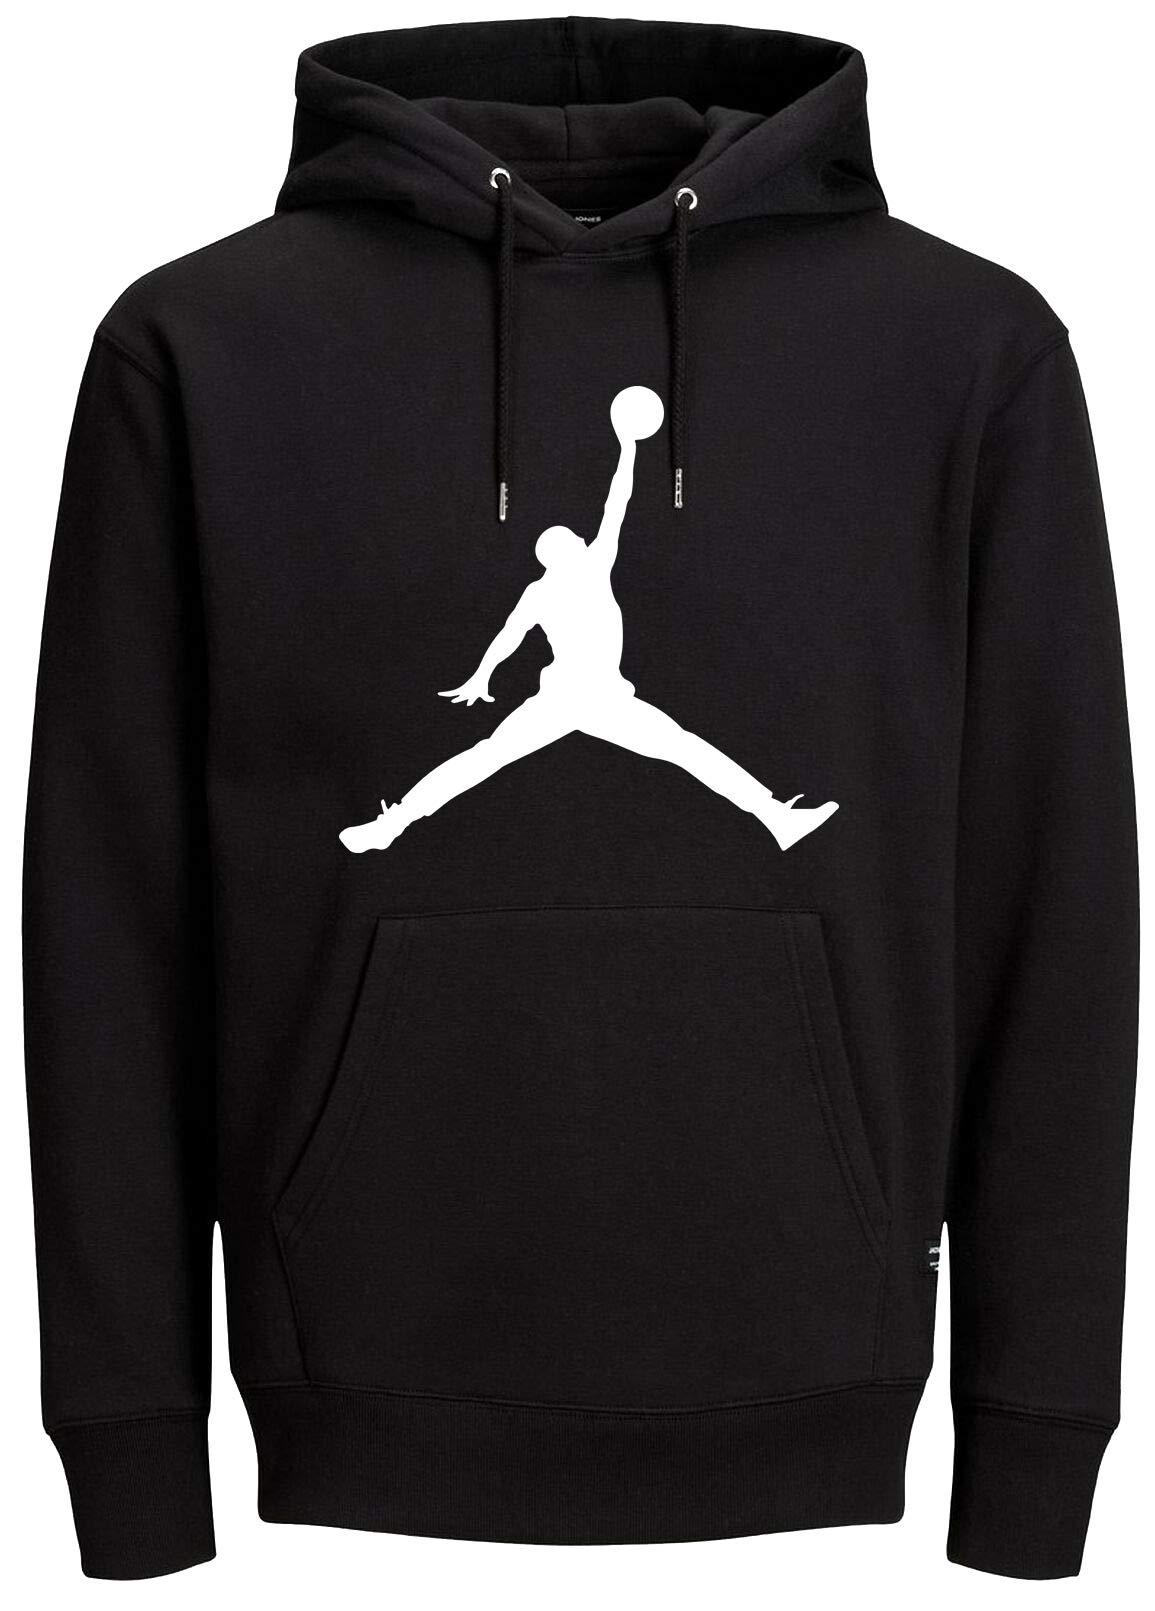 ABSOLUTE DEFENSE Basketball Hoodies for Men Women Casual Sweatshirt Regular fit Winter Jacket Boy Girl Hoodie Black (B07Y72ZL19) Amazon Price History, Amazon Price Tracker